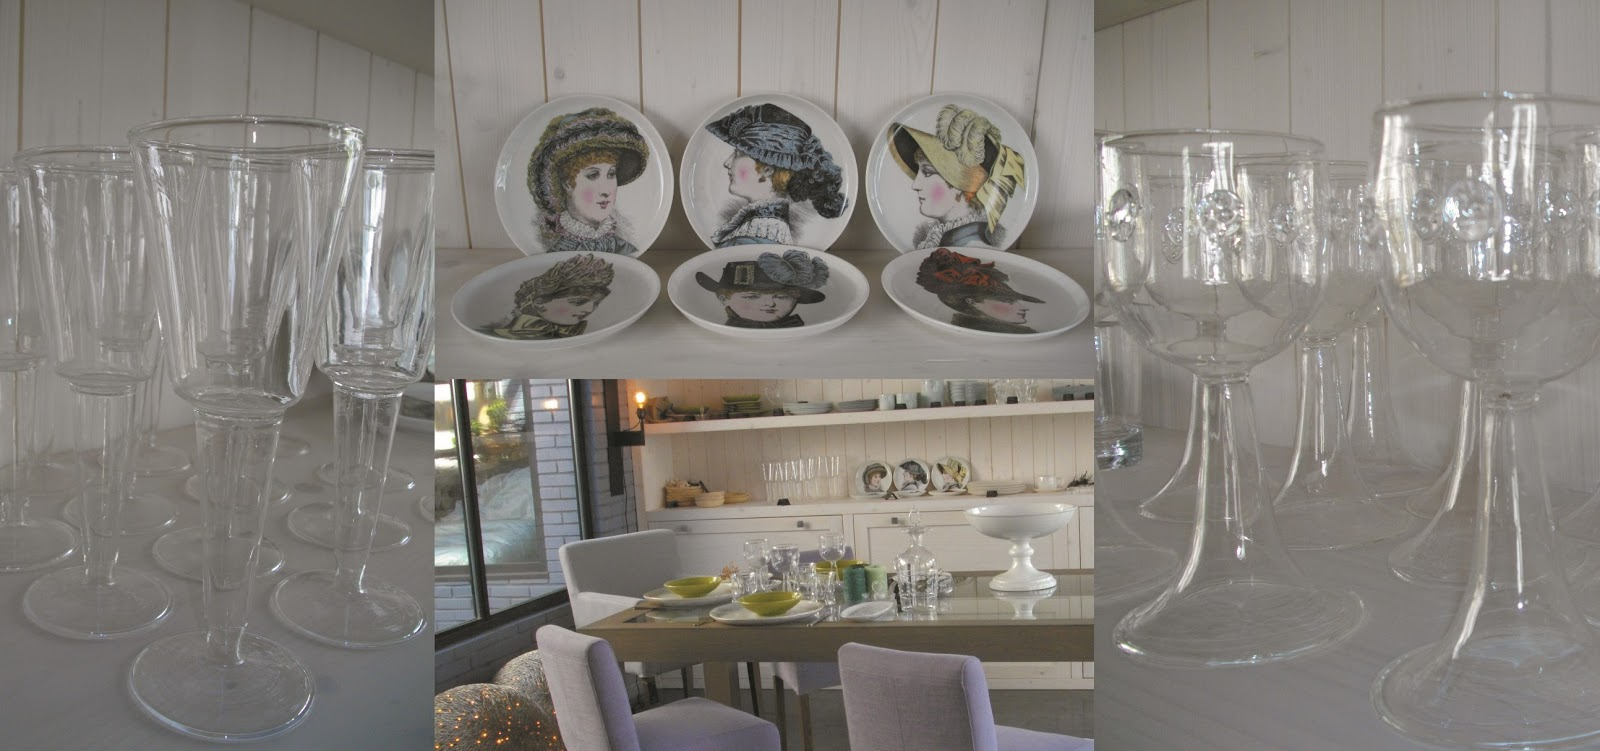 mona market art de la table. Black Bedroom Furniture Sets. Home Design Ideas